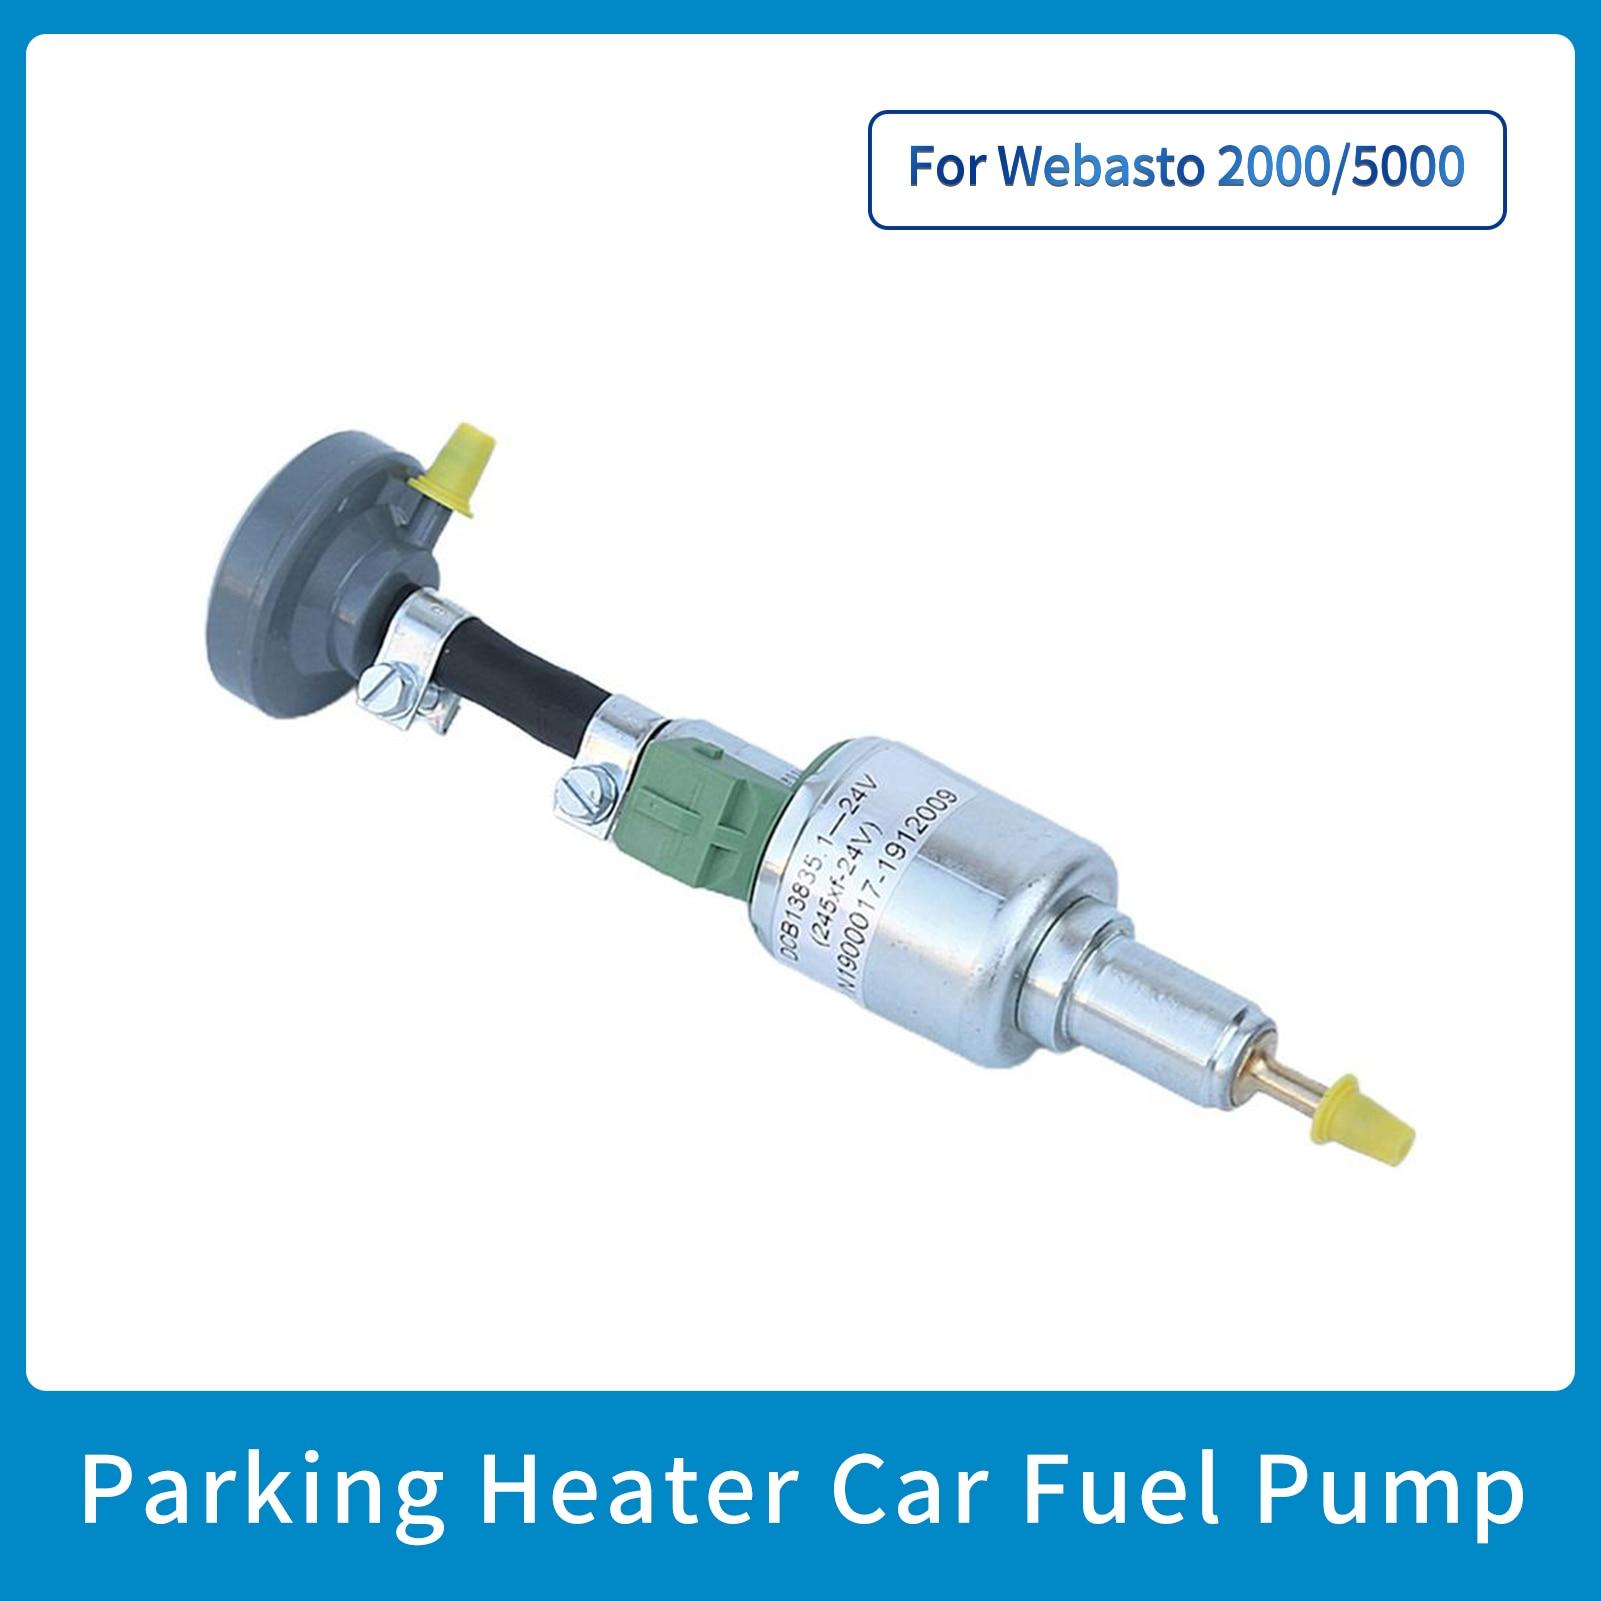 1* Clear Transparent Oil Pump Fuel Pipe Hose 3.5m For Air Diesel Parking Heater